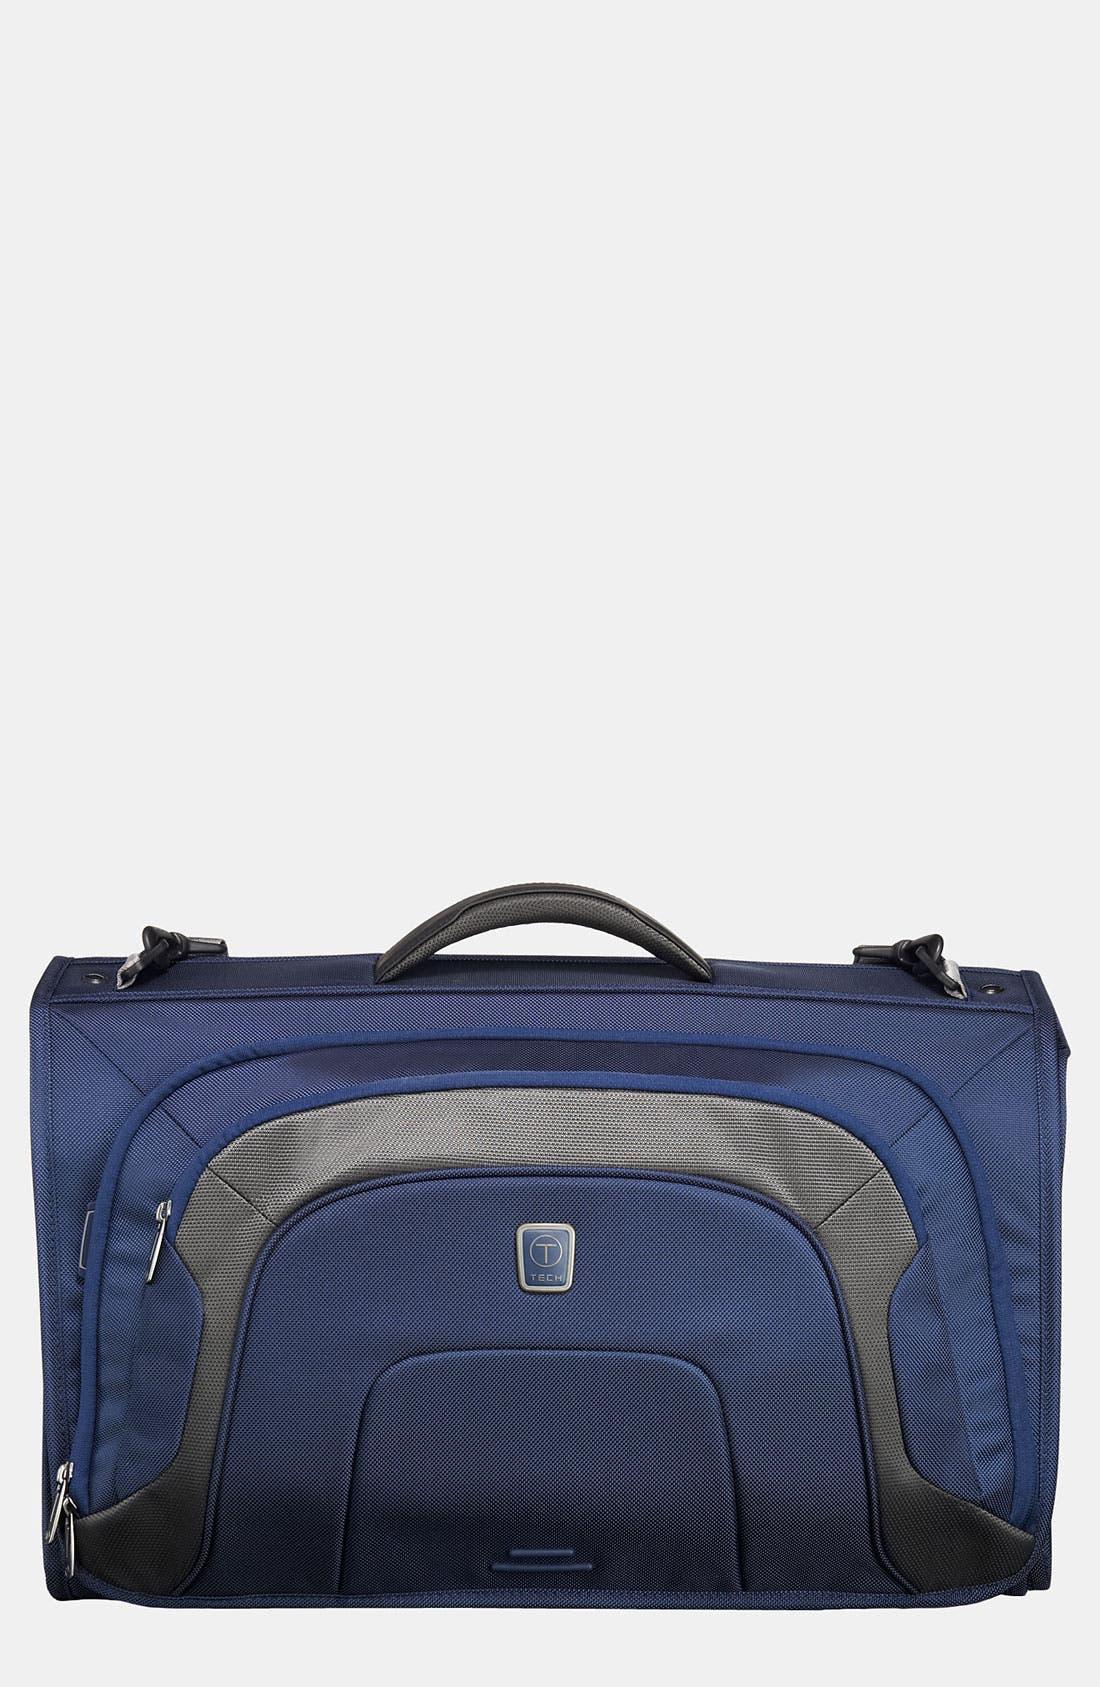 Main Image - T-Tech by Tumi 'Presidio Kobbe' Trifold Garment Bag